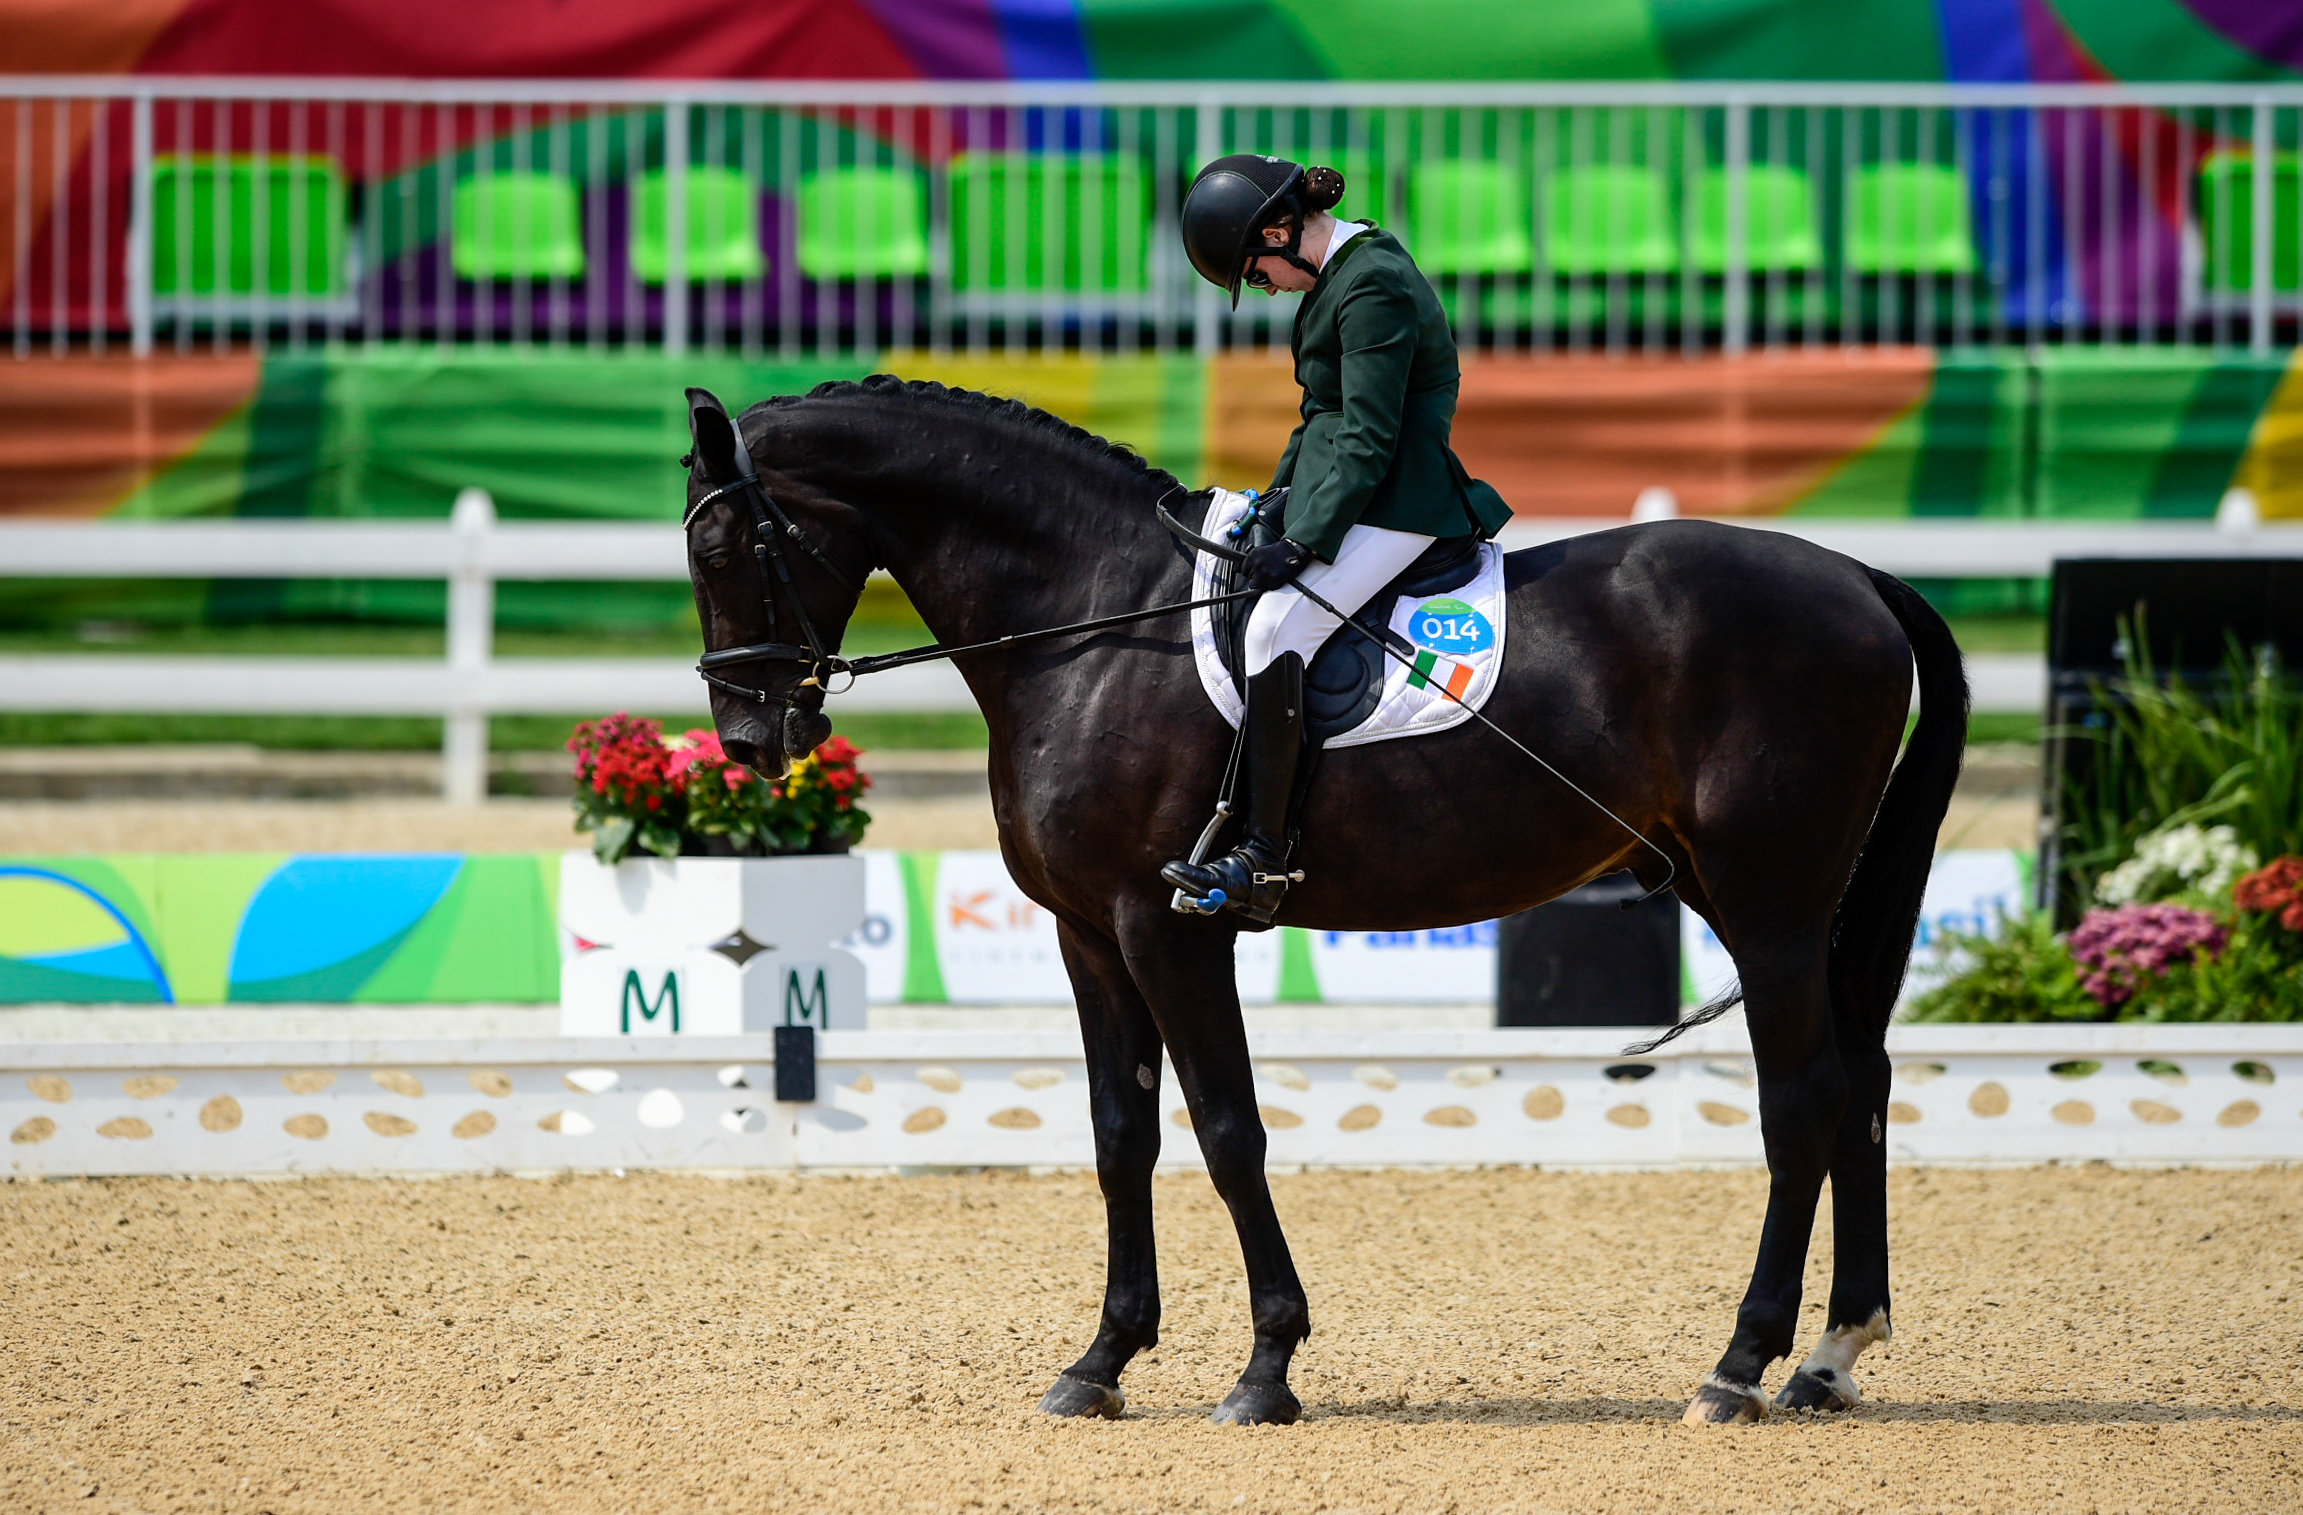 Equestrian: Helen Kearney in the Individual Grade 1a